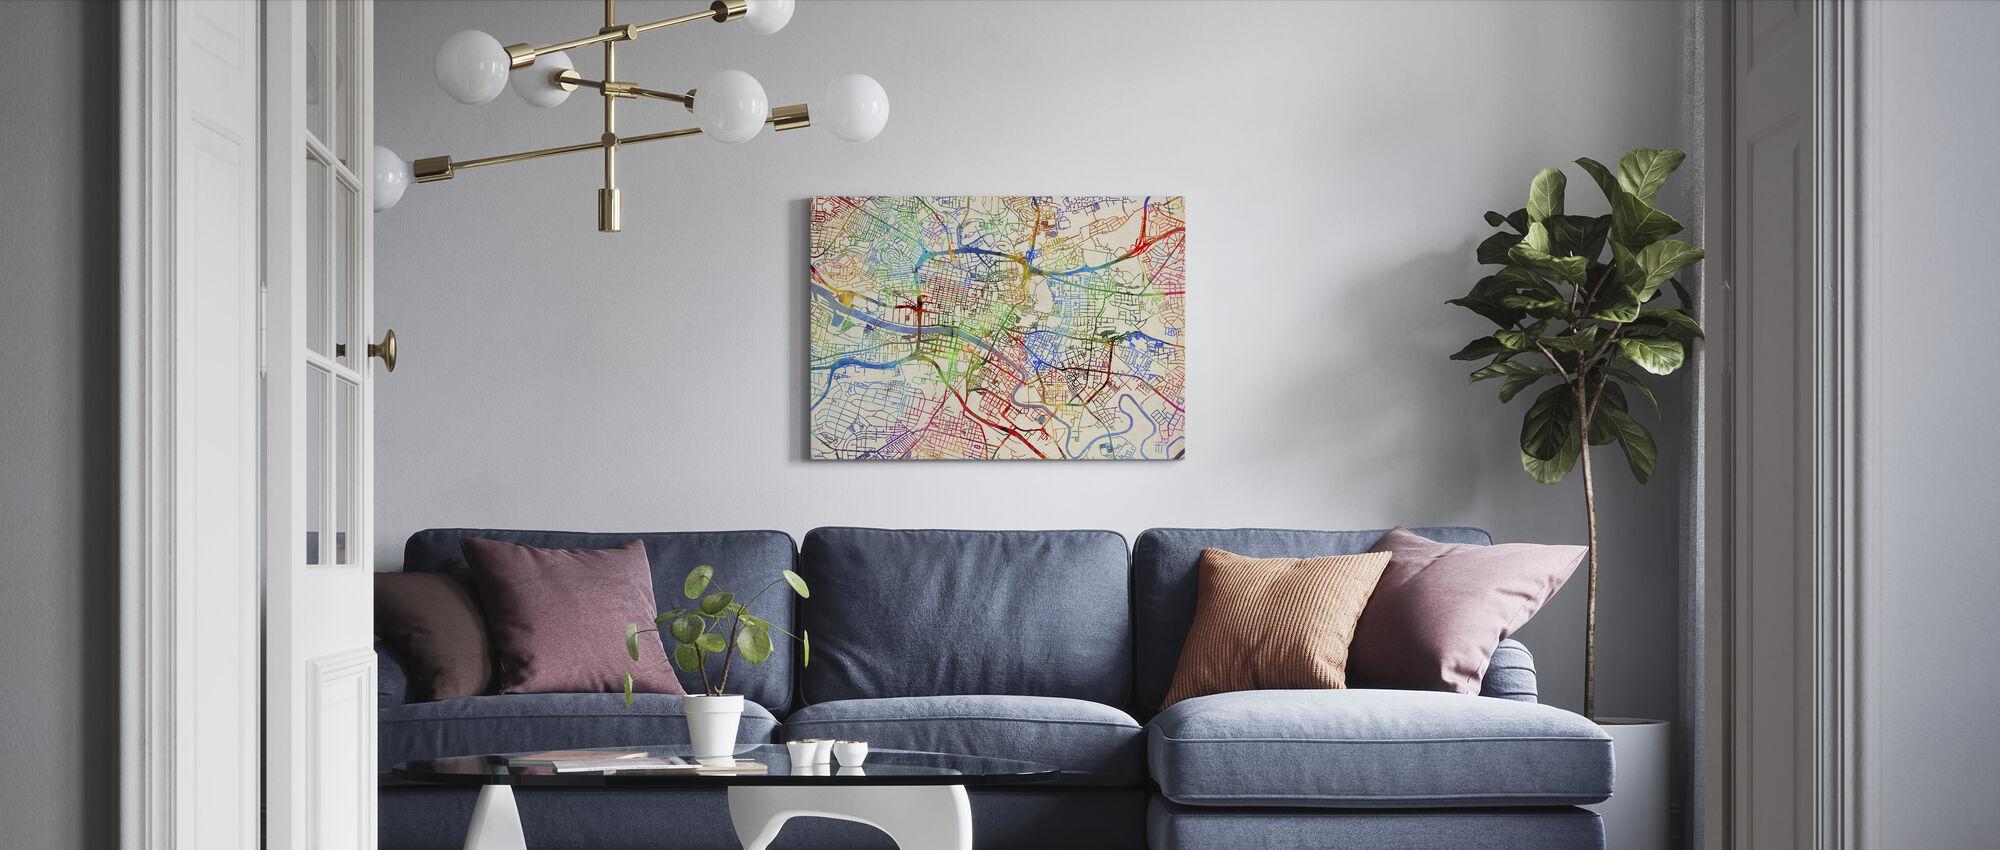 Glasgow Street Map - Canvas print - Living Room